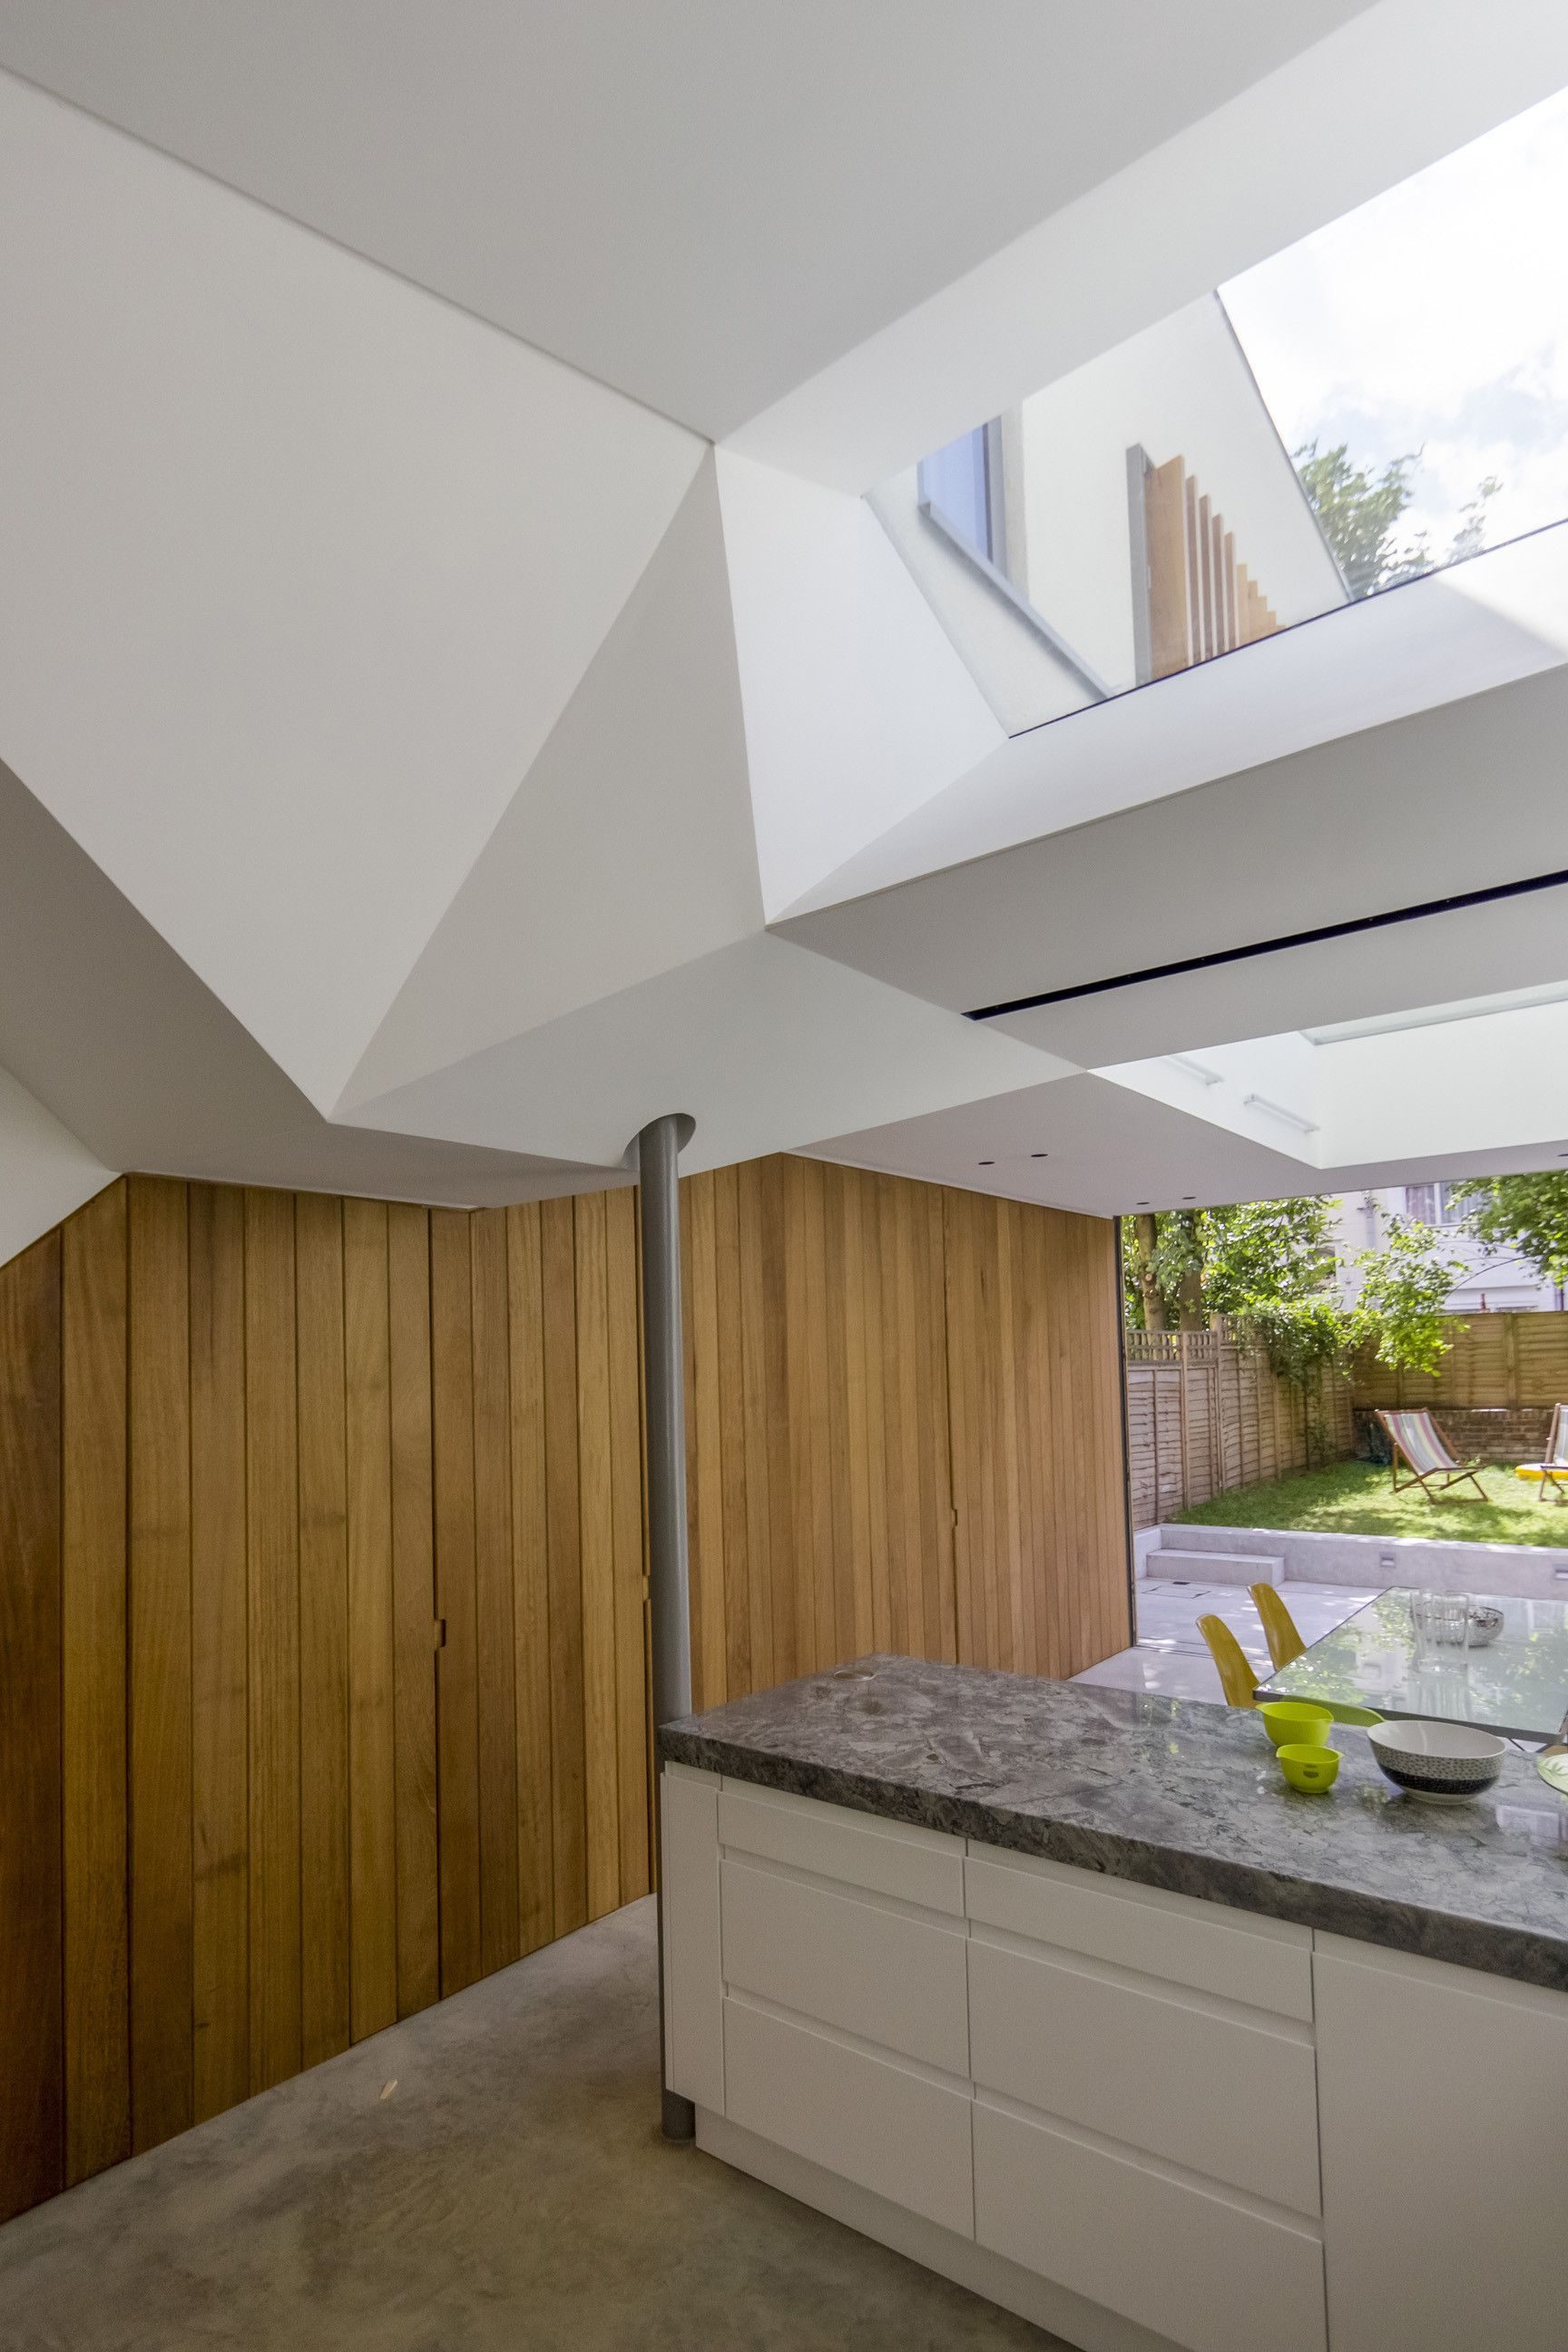 Galeria - Casa Islington / Neil Dusheiko Architects - 14